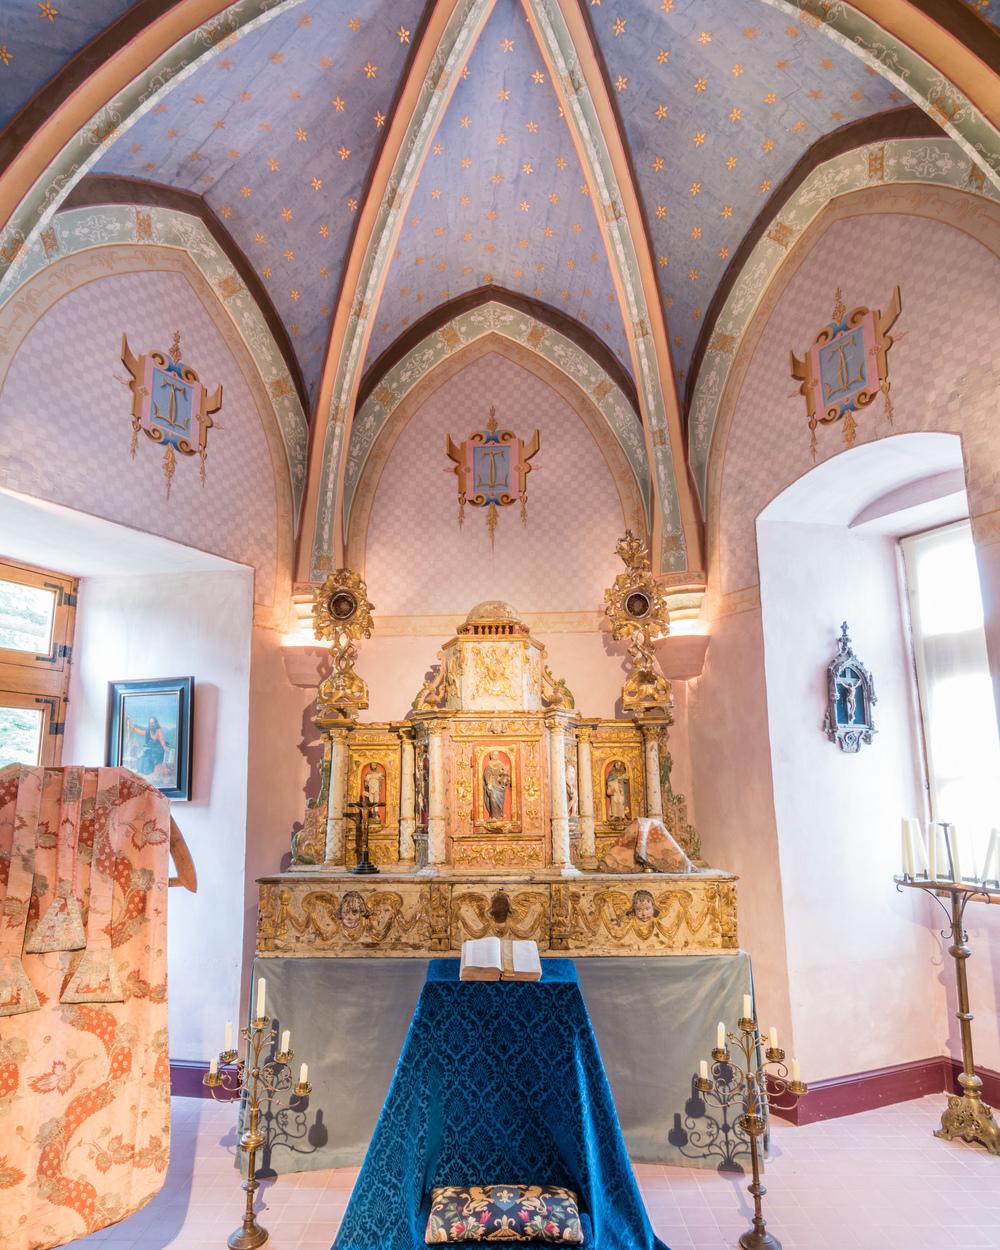 Salle de l'Oratoire